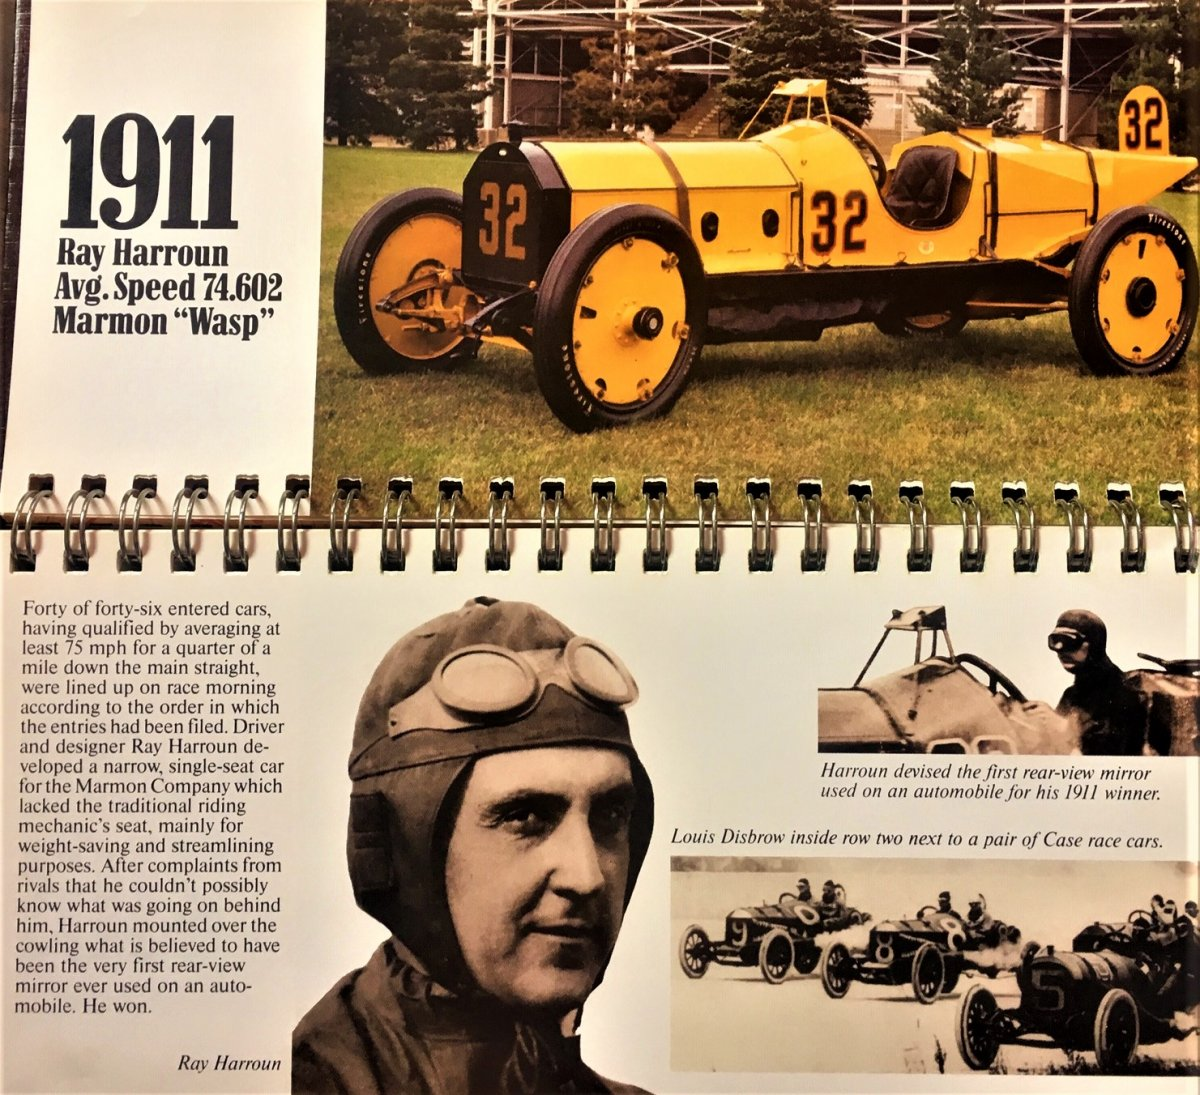 ray haroun 1911 (2).jpg